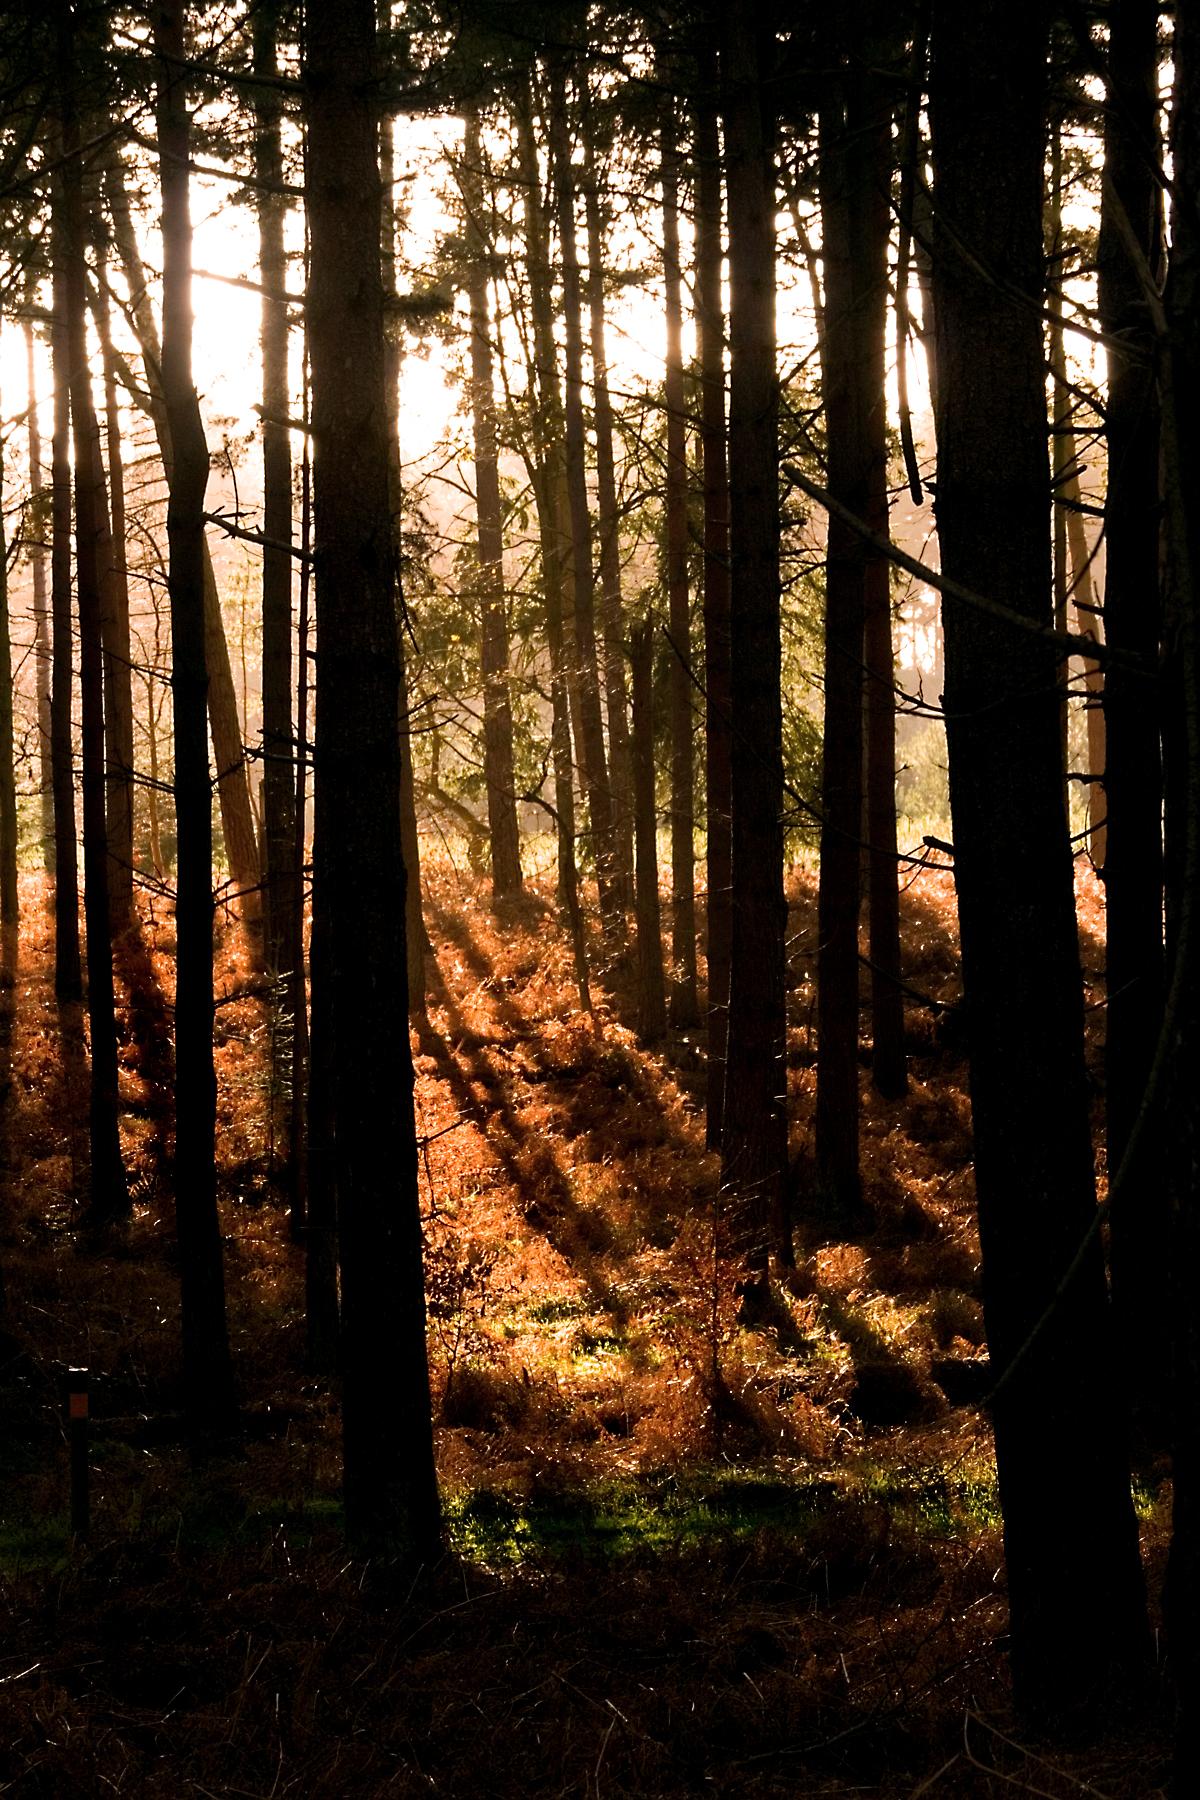 thetford forest wikipedia